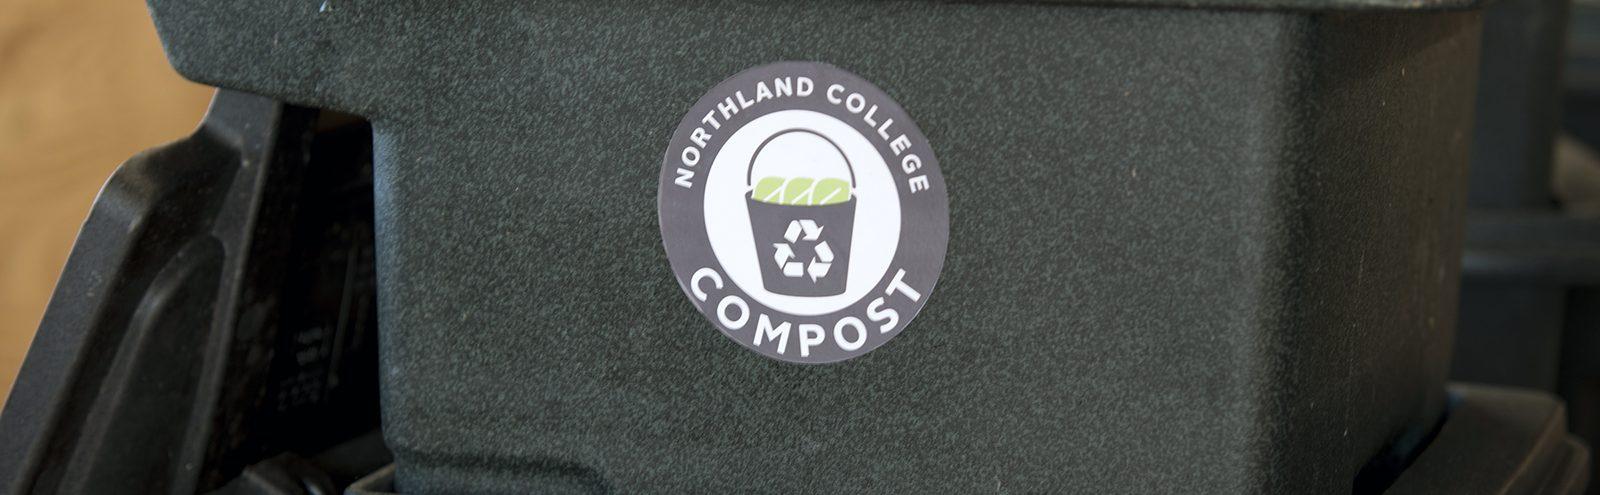 Northland College compost bins